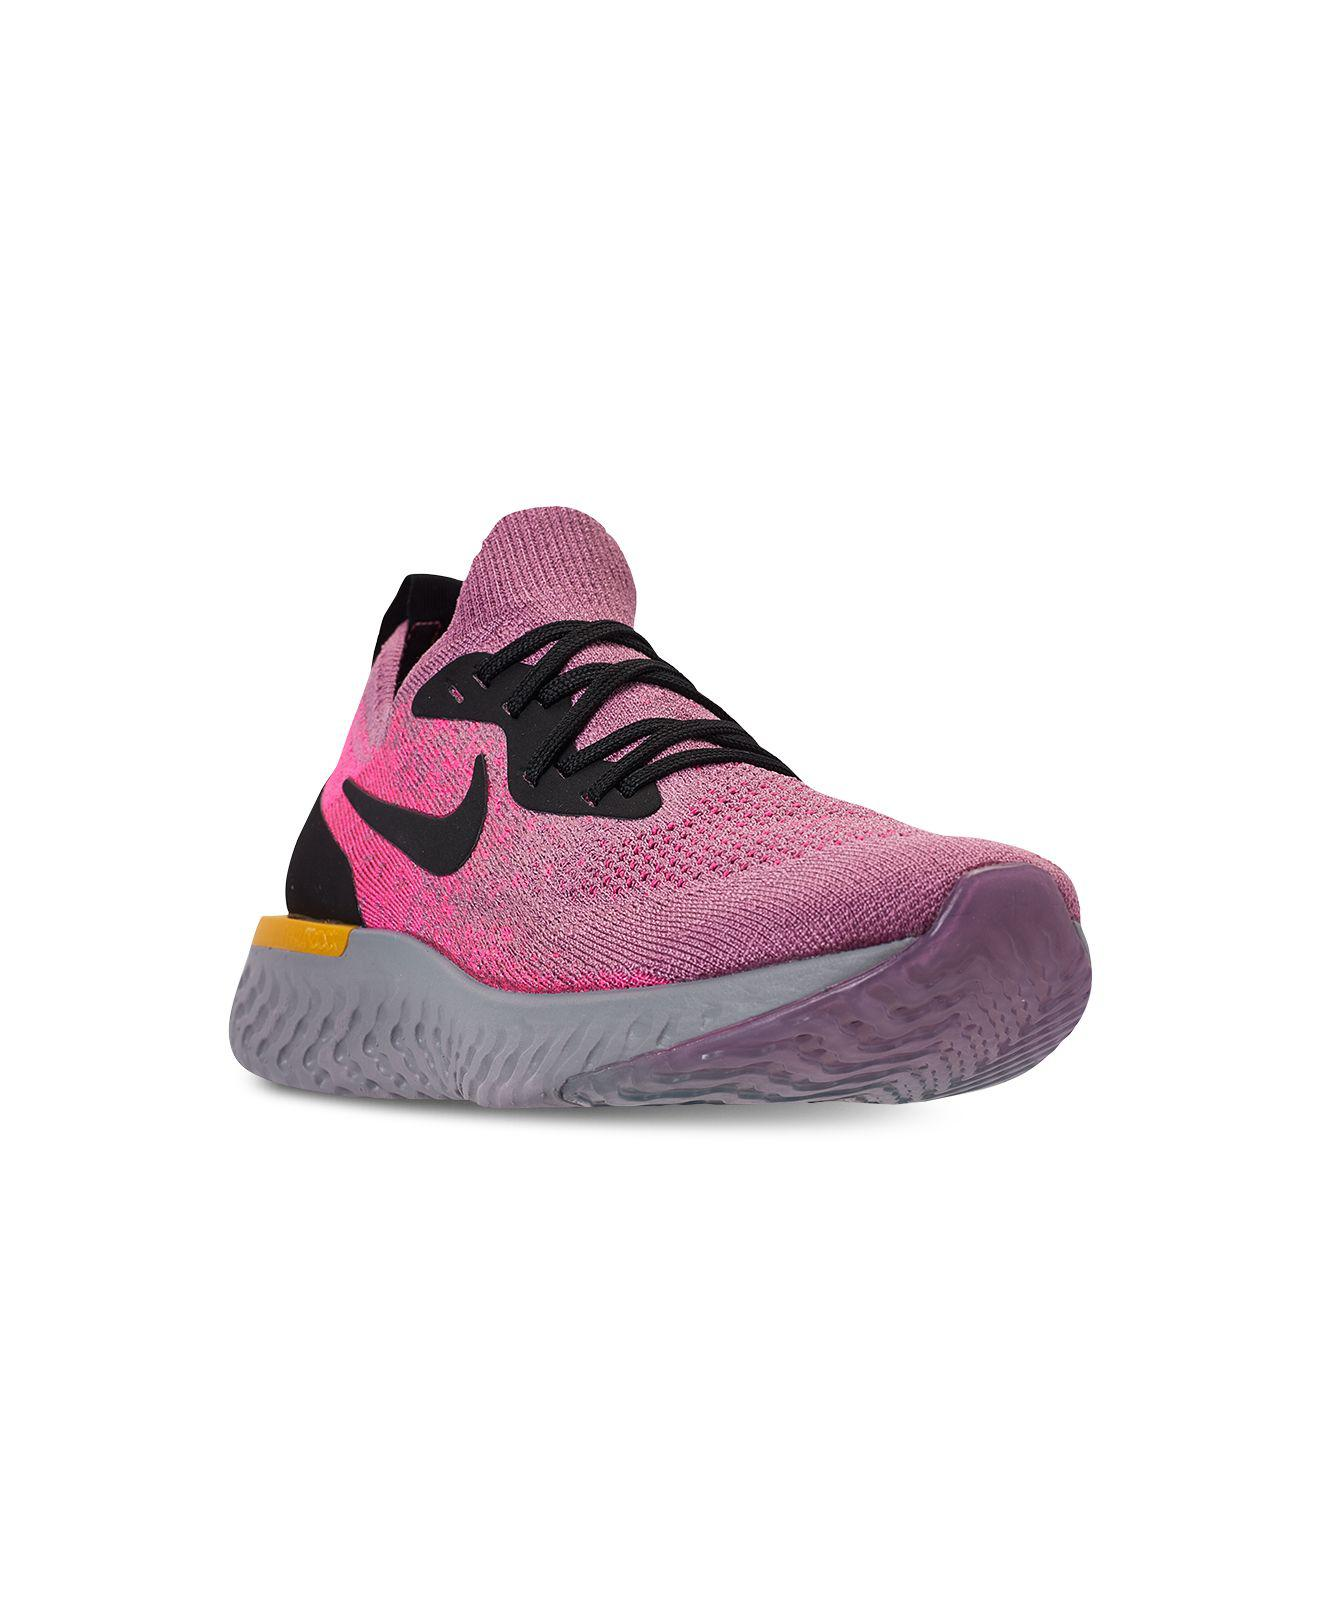 2eb88c227f21 Lyst - Nike Epic React Flyknit in Purple - Save 62%